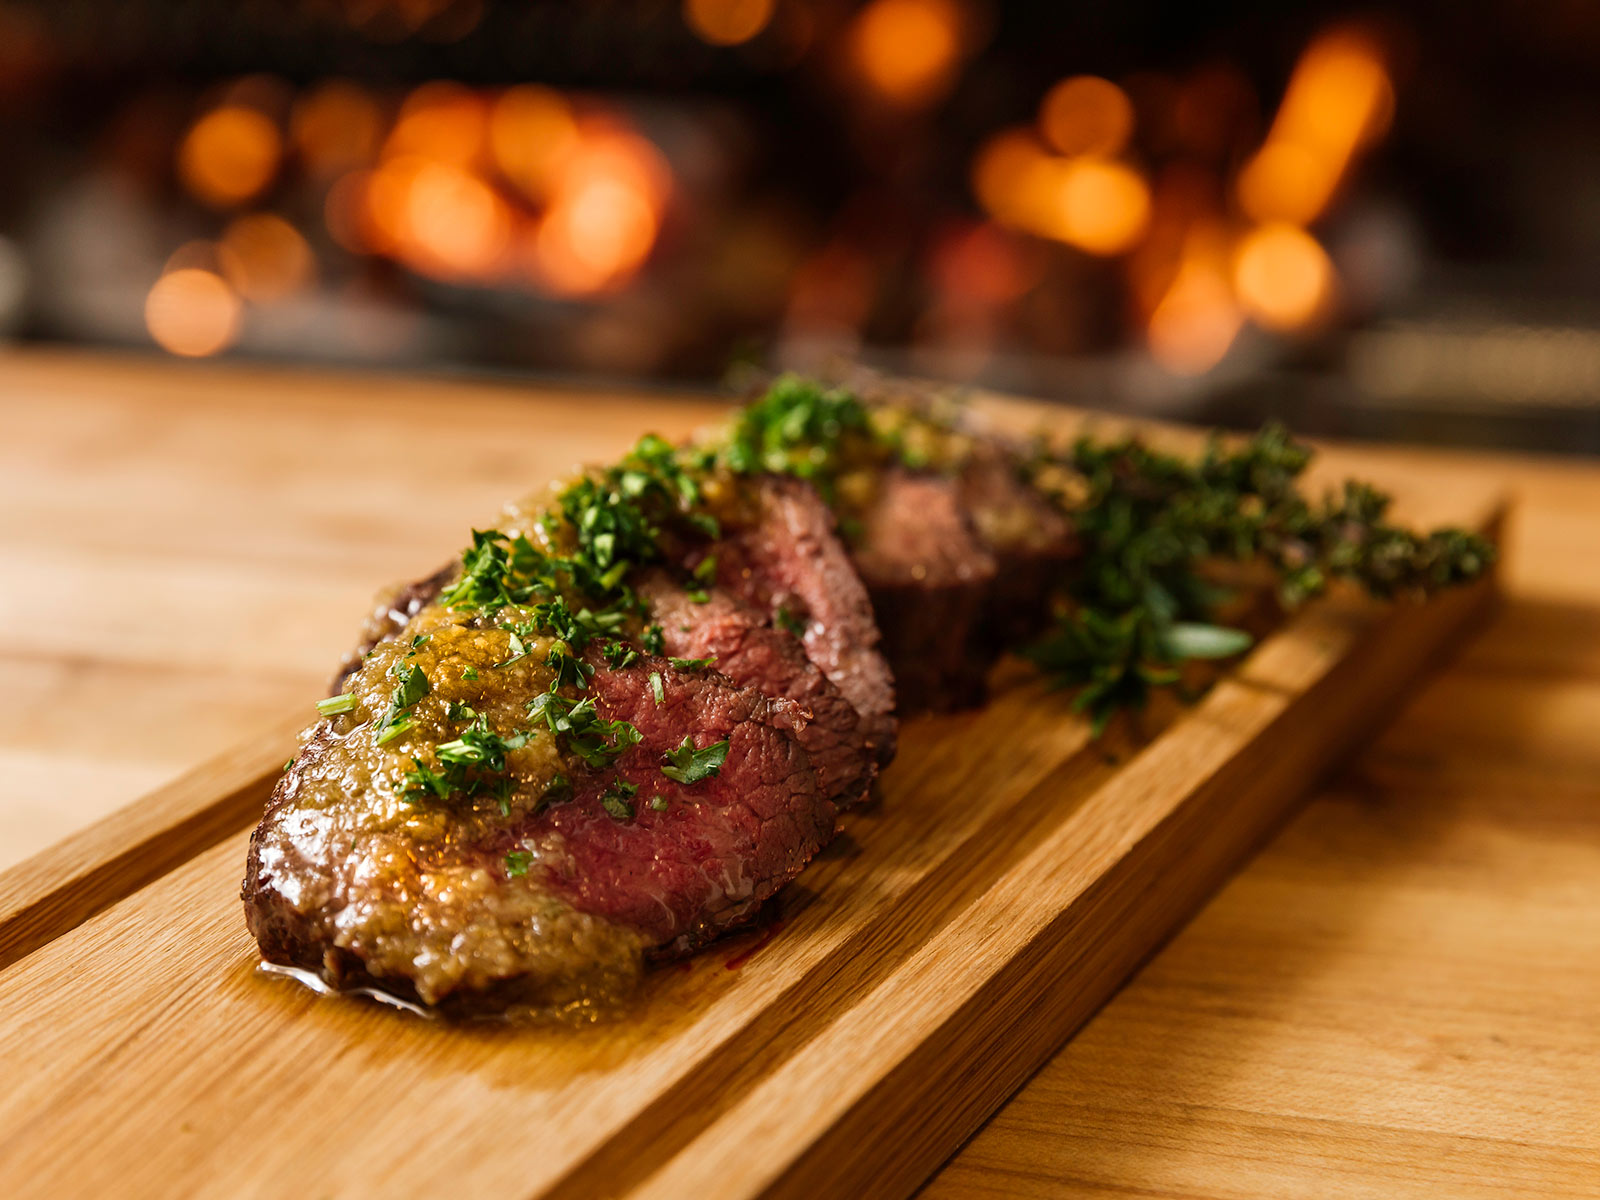 Steak at Jackson WY Dining